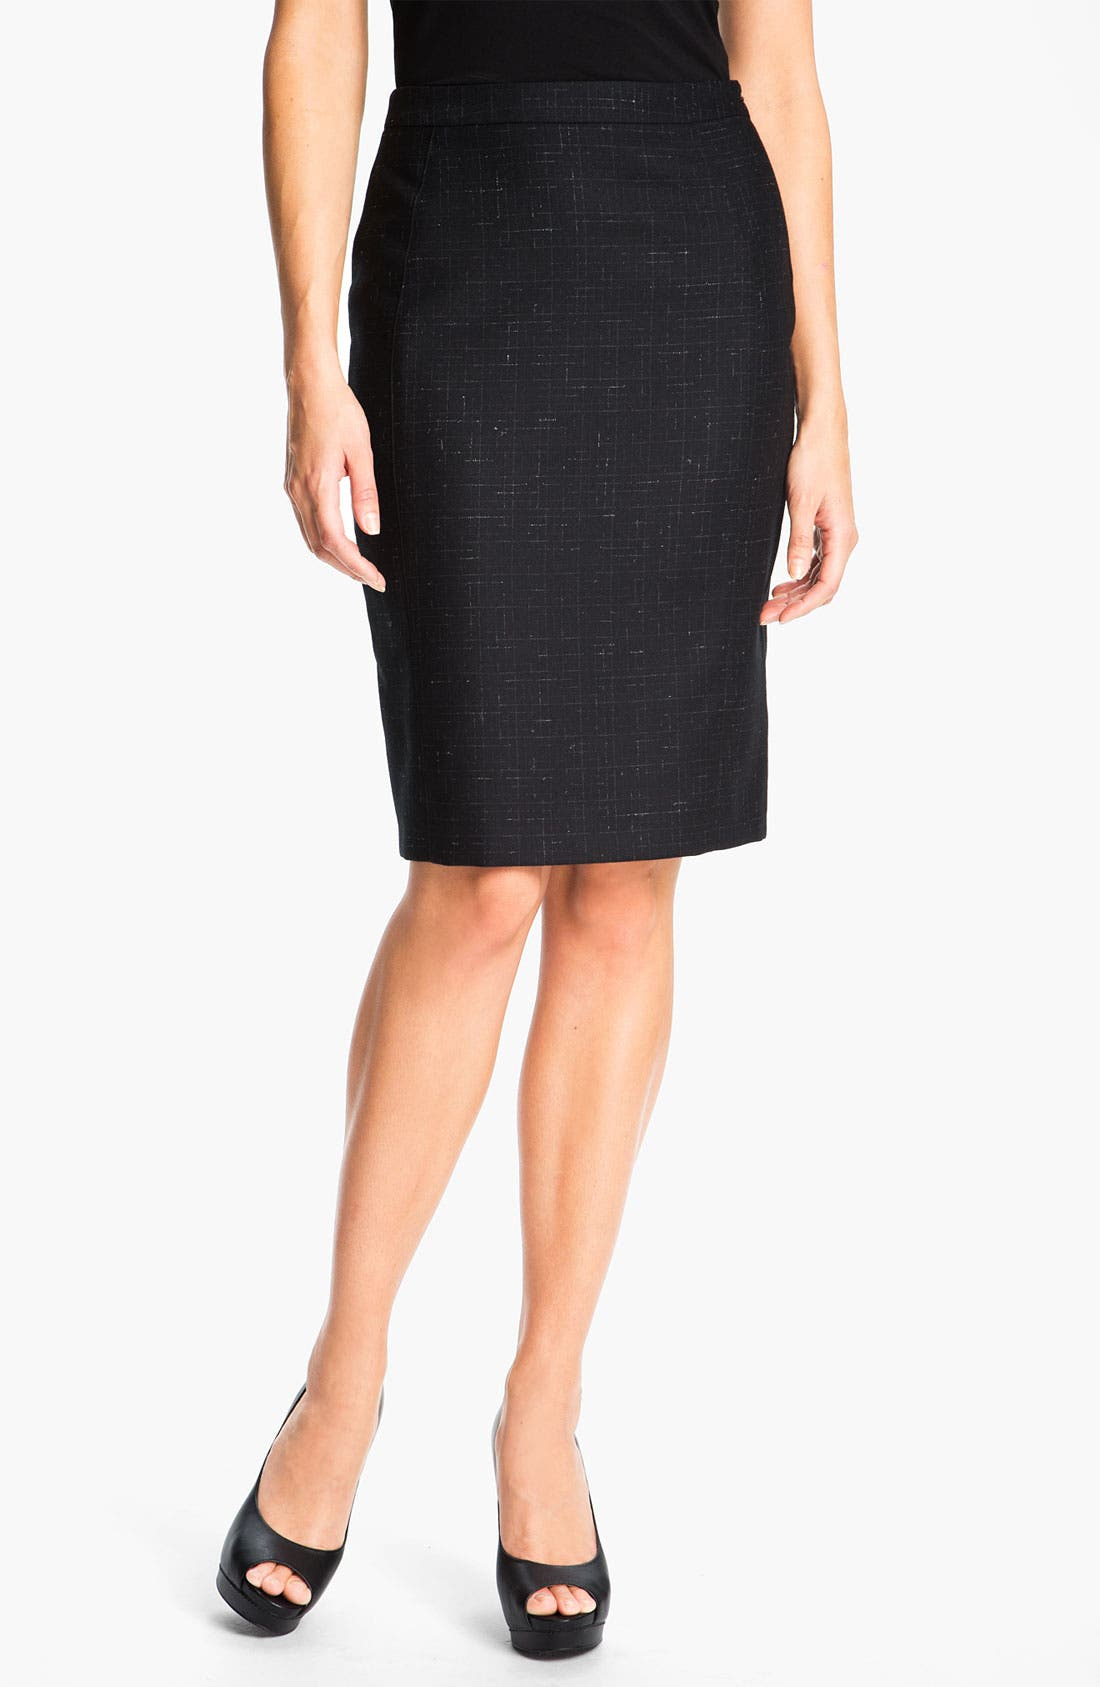 Alternate Image 1 Selected - Zanella 'Carol' Wool Skirt